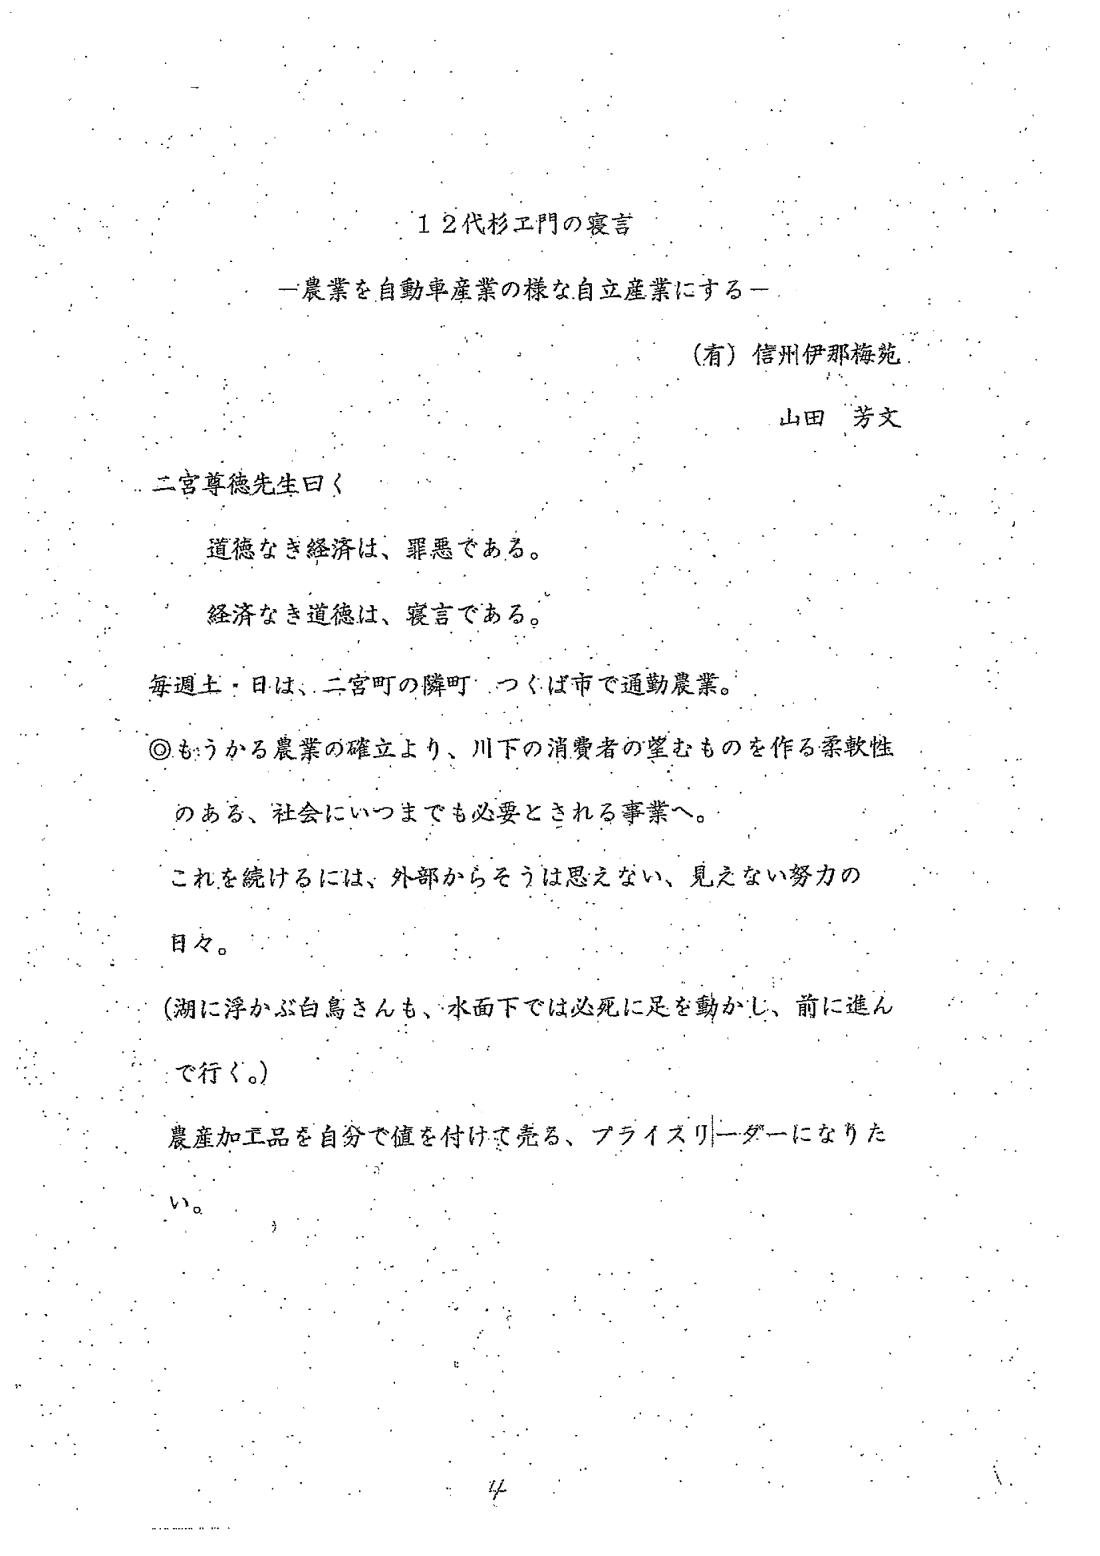 28長野支部総会資料_ページ_5.png